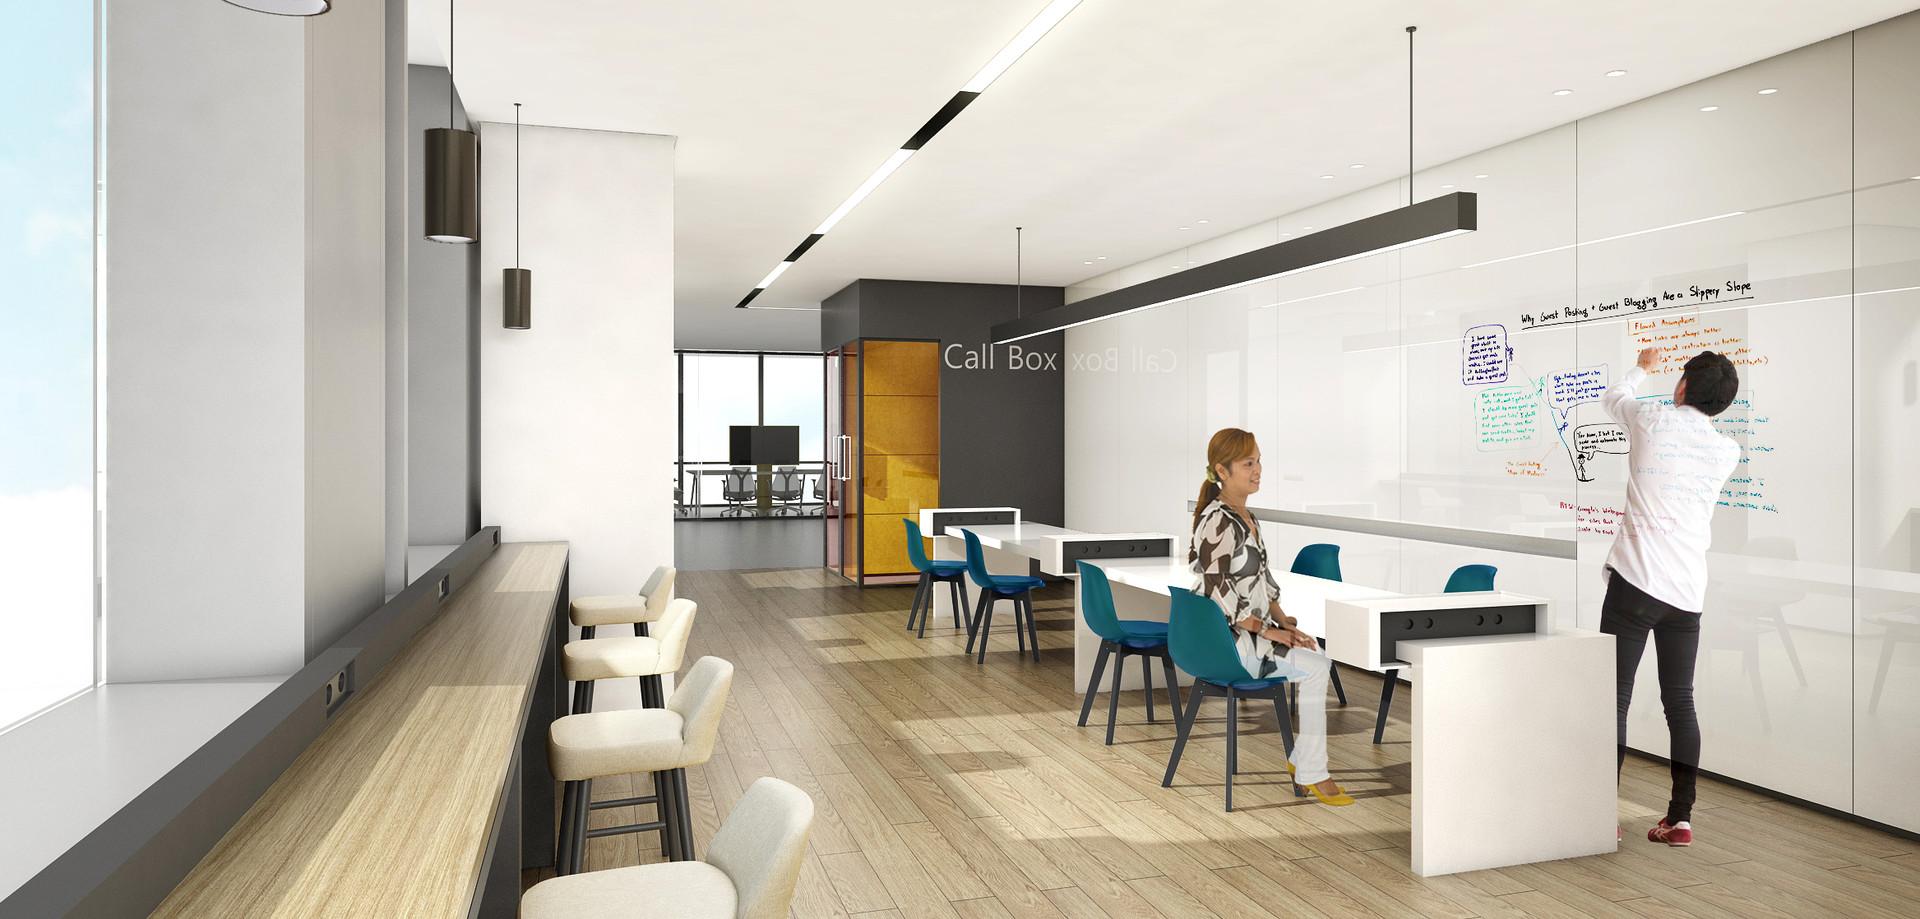 01_ Collabo-lounge 2.jpg